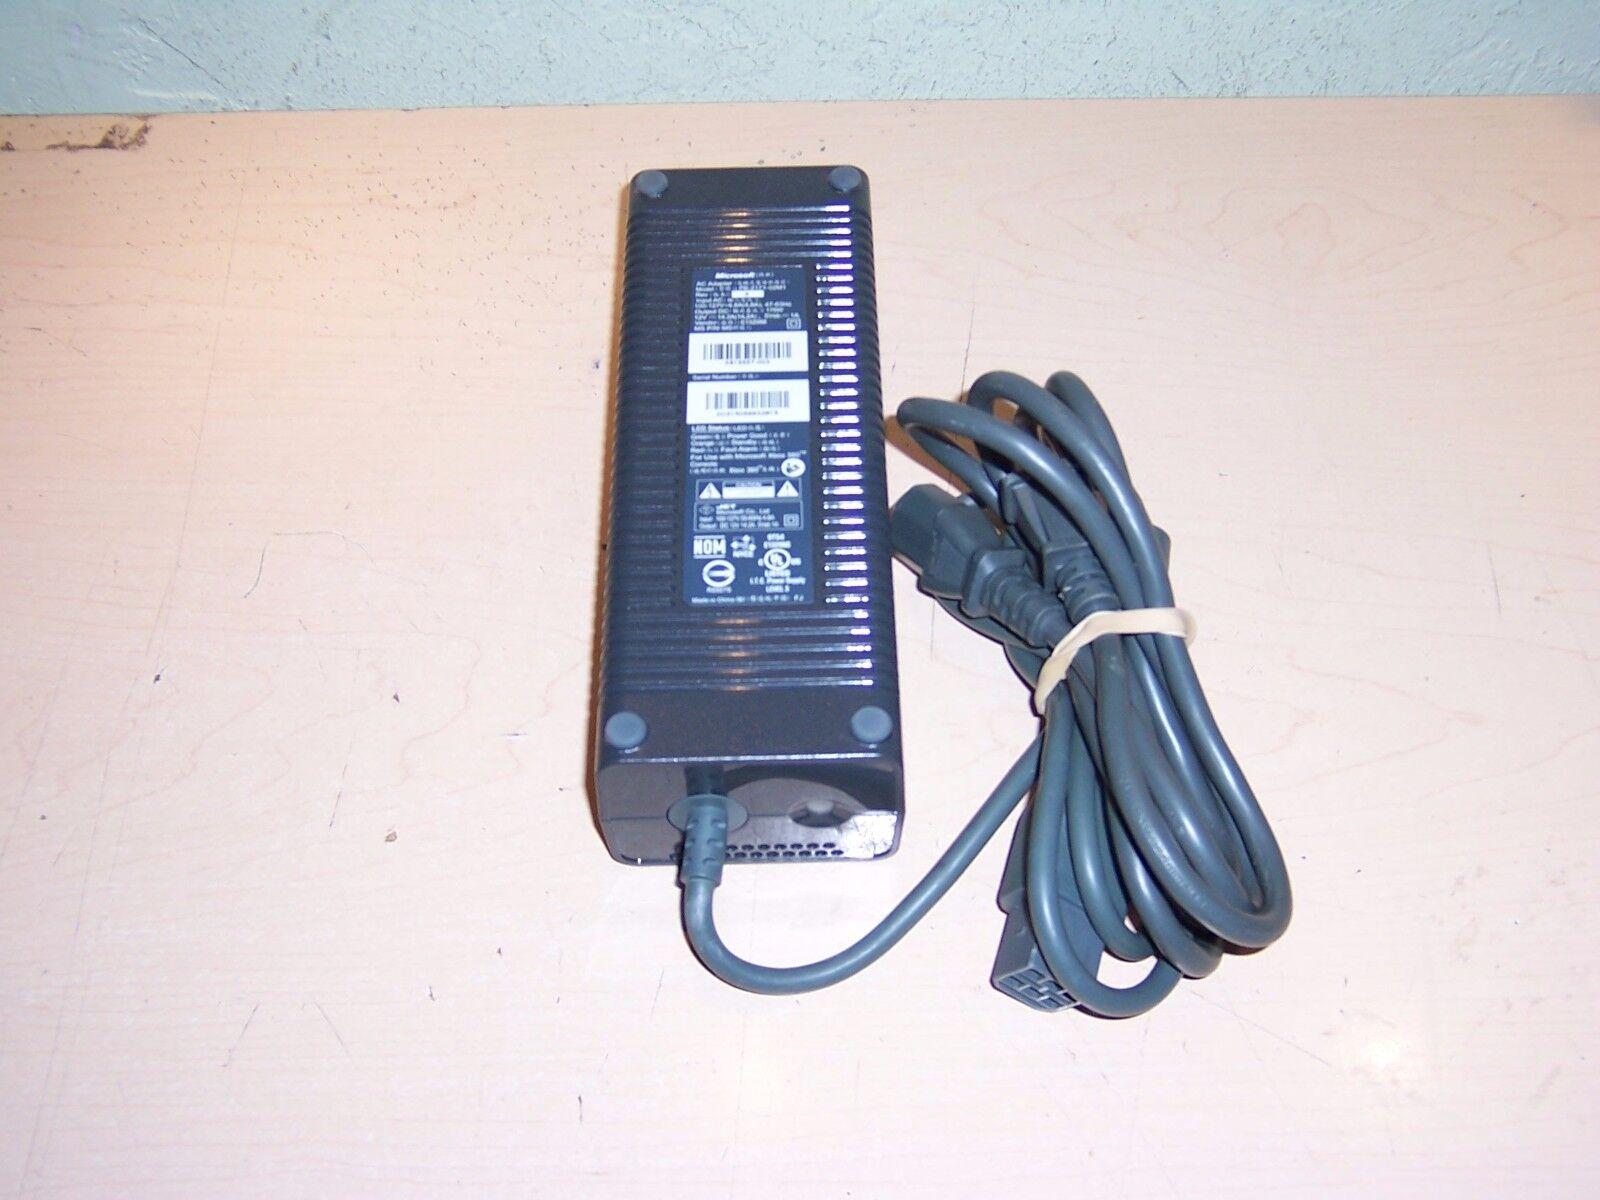 XBox X-Box POWER SUPPLY AC ADAPTER PB-2171-02M1